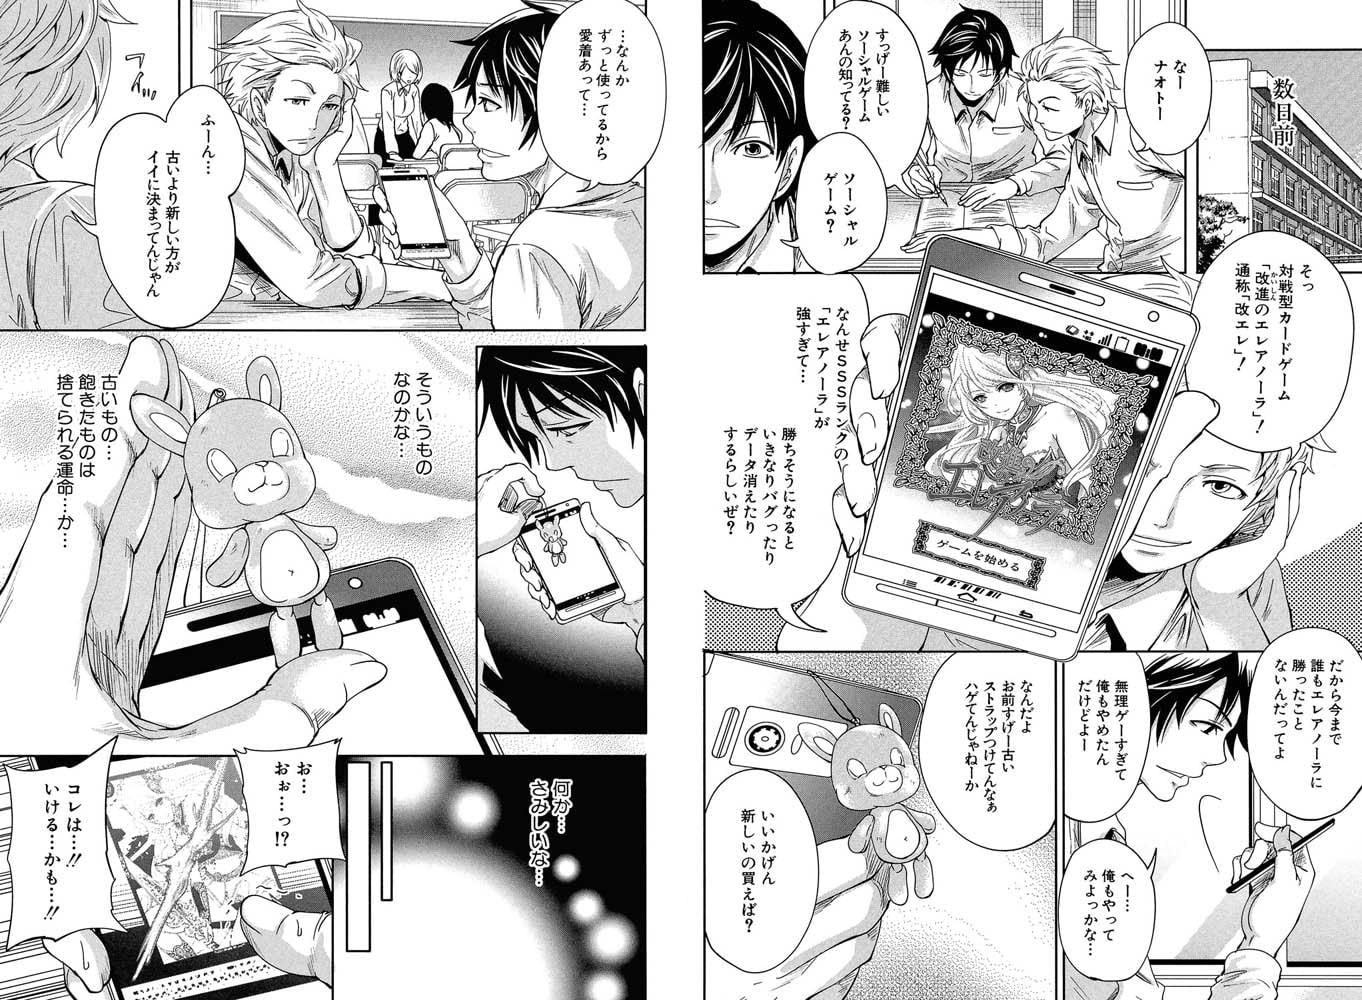 【JK】宮原歩先生2冊パック(202011)